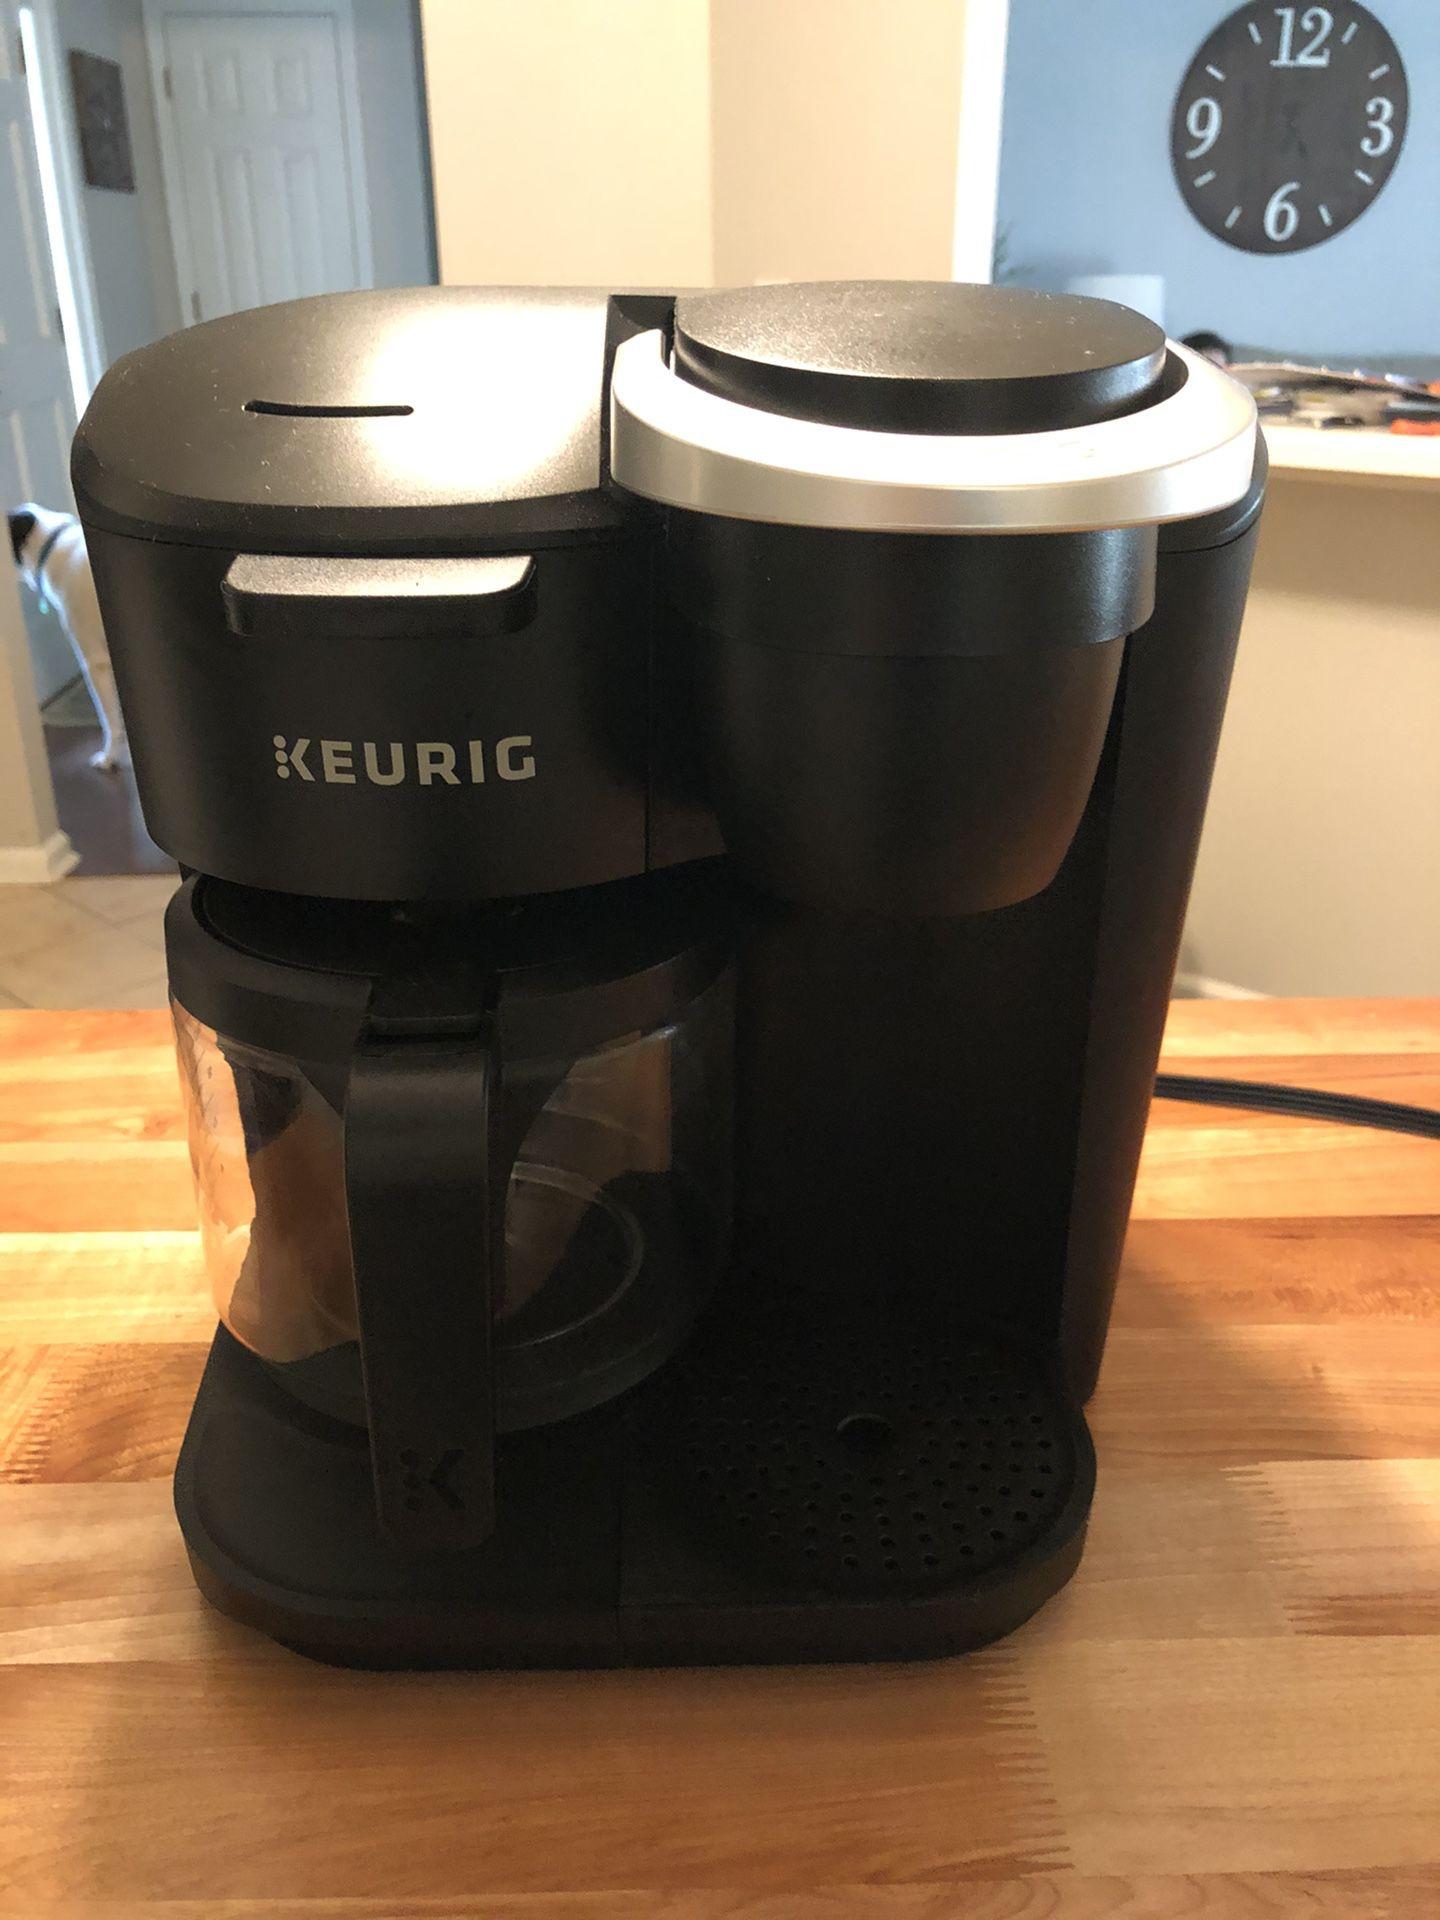 Keurig K-Duo Essentials & K-cup holder